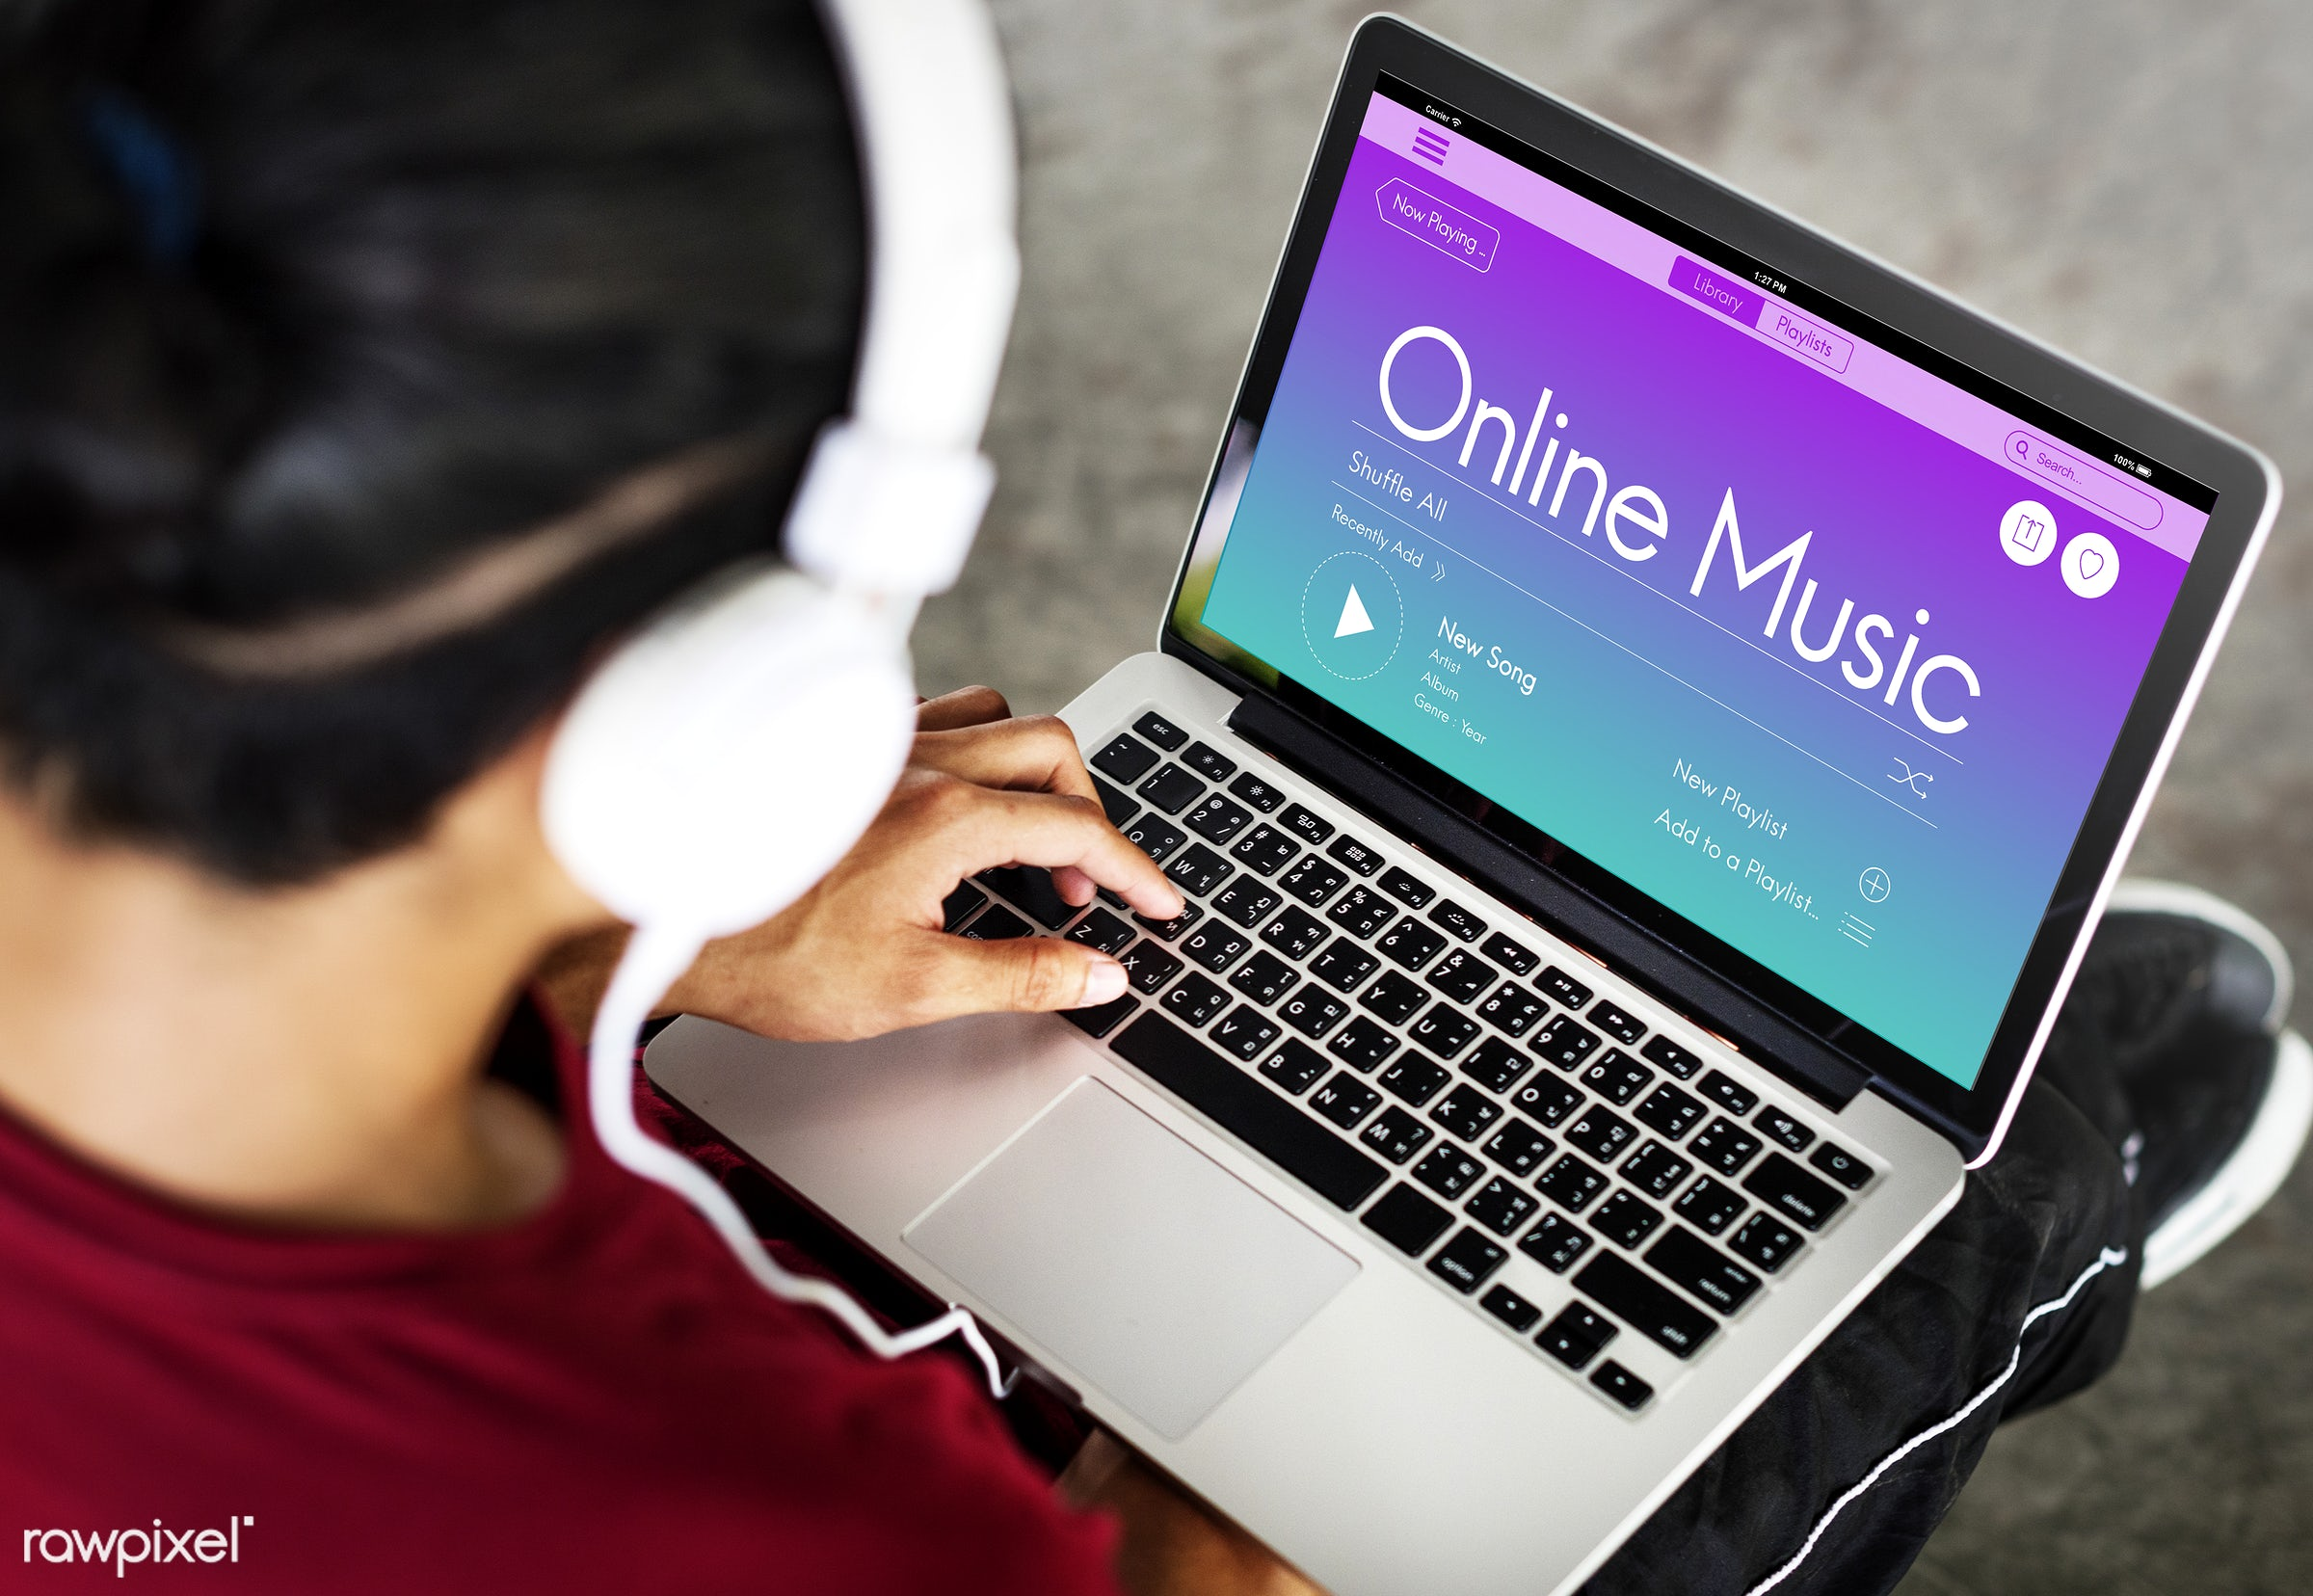 application, audio, browse, browsing, connect, connection, enjoyment, entertainment, fun, graphic, headphones, idea, joy,...